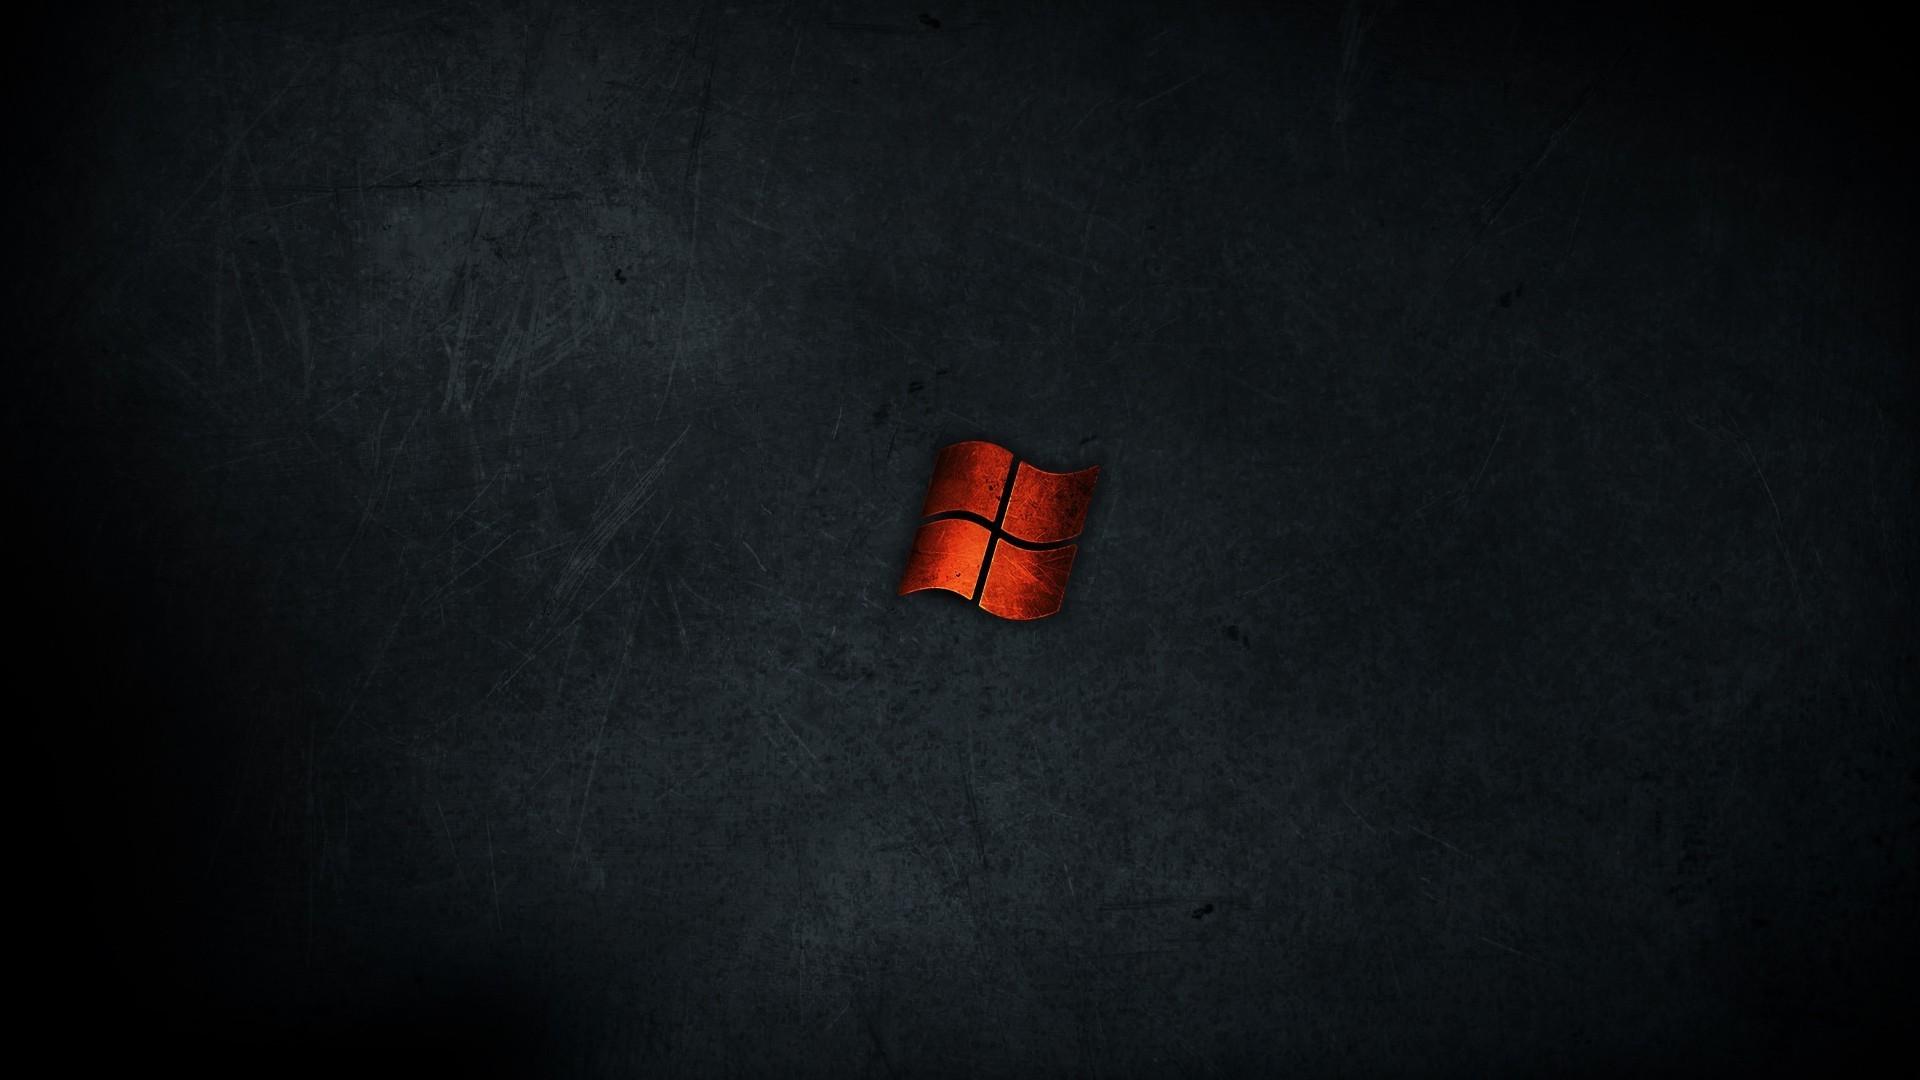 Microsoft Windows 1360×768 Resolution